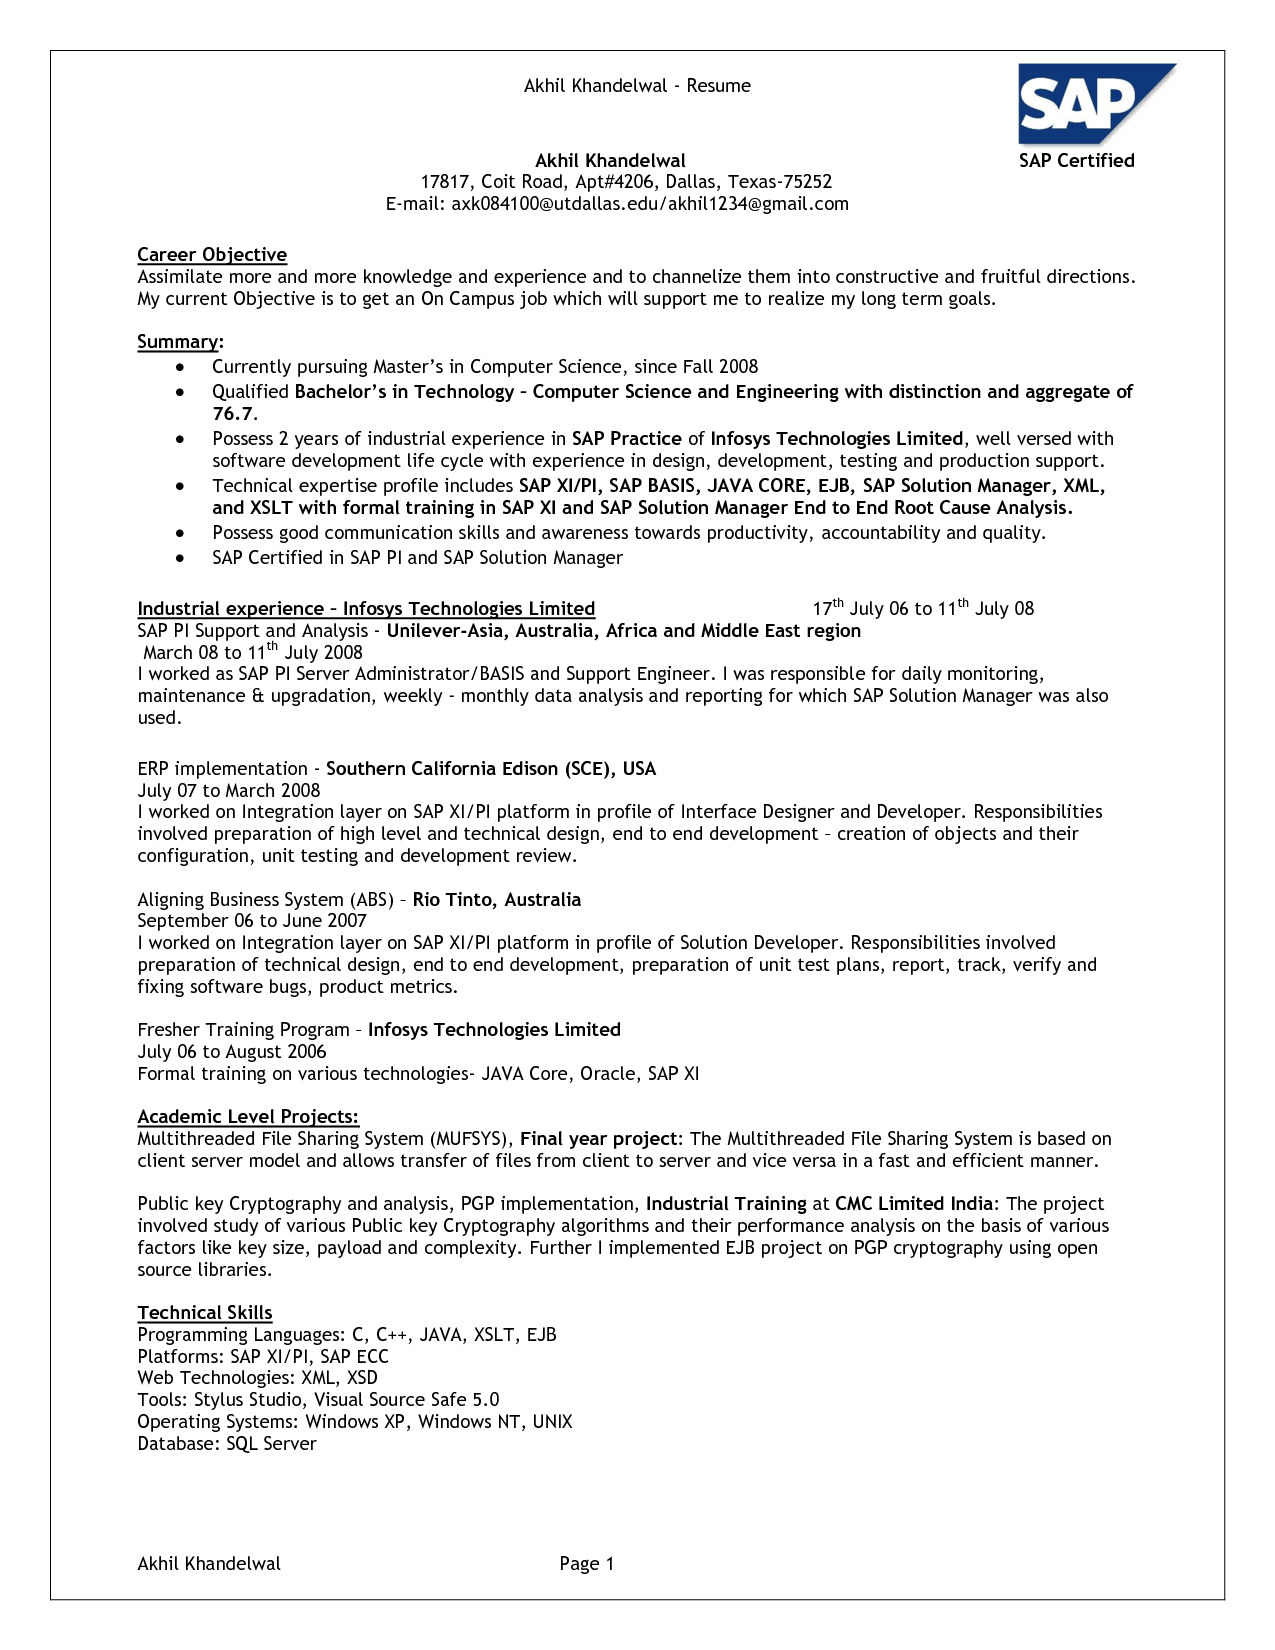 Sap Data Migration Resume Resume Ideas Job Resume Resume Format Best Resume Format